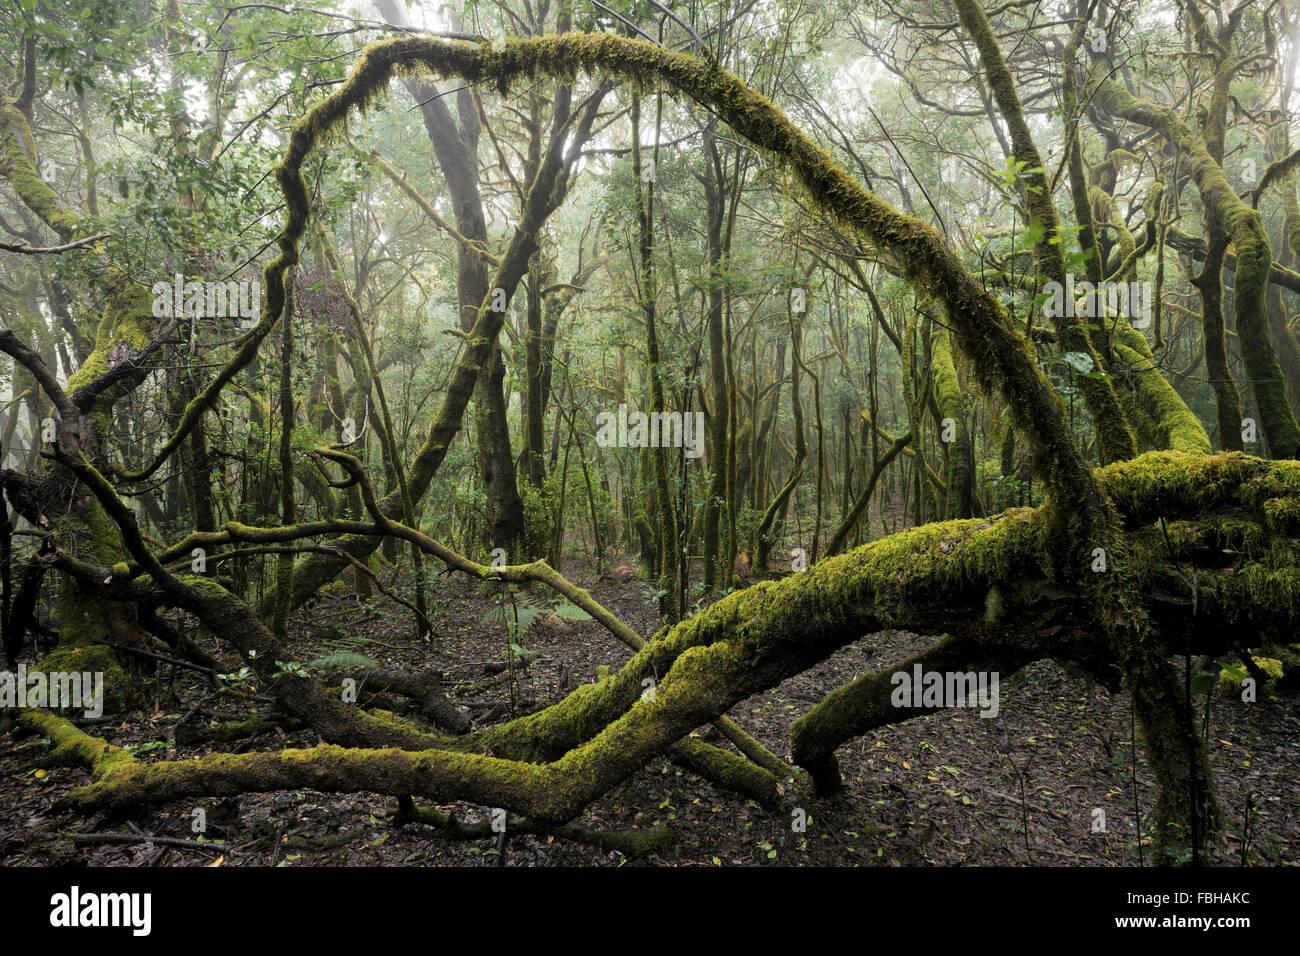 Spanien, La Gomera, Lorbeer, Wald, Moos, Skurril, Bäume, Äste, Farben, Stimmung, Nebel, mystisch, Vegetation, Stockbild